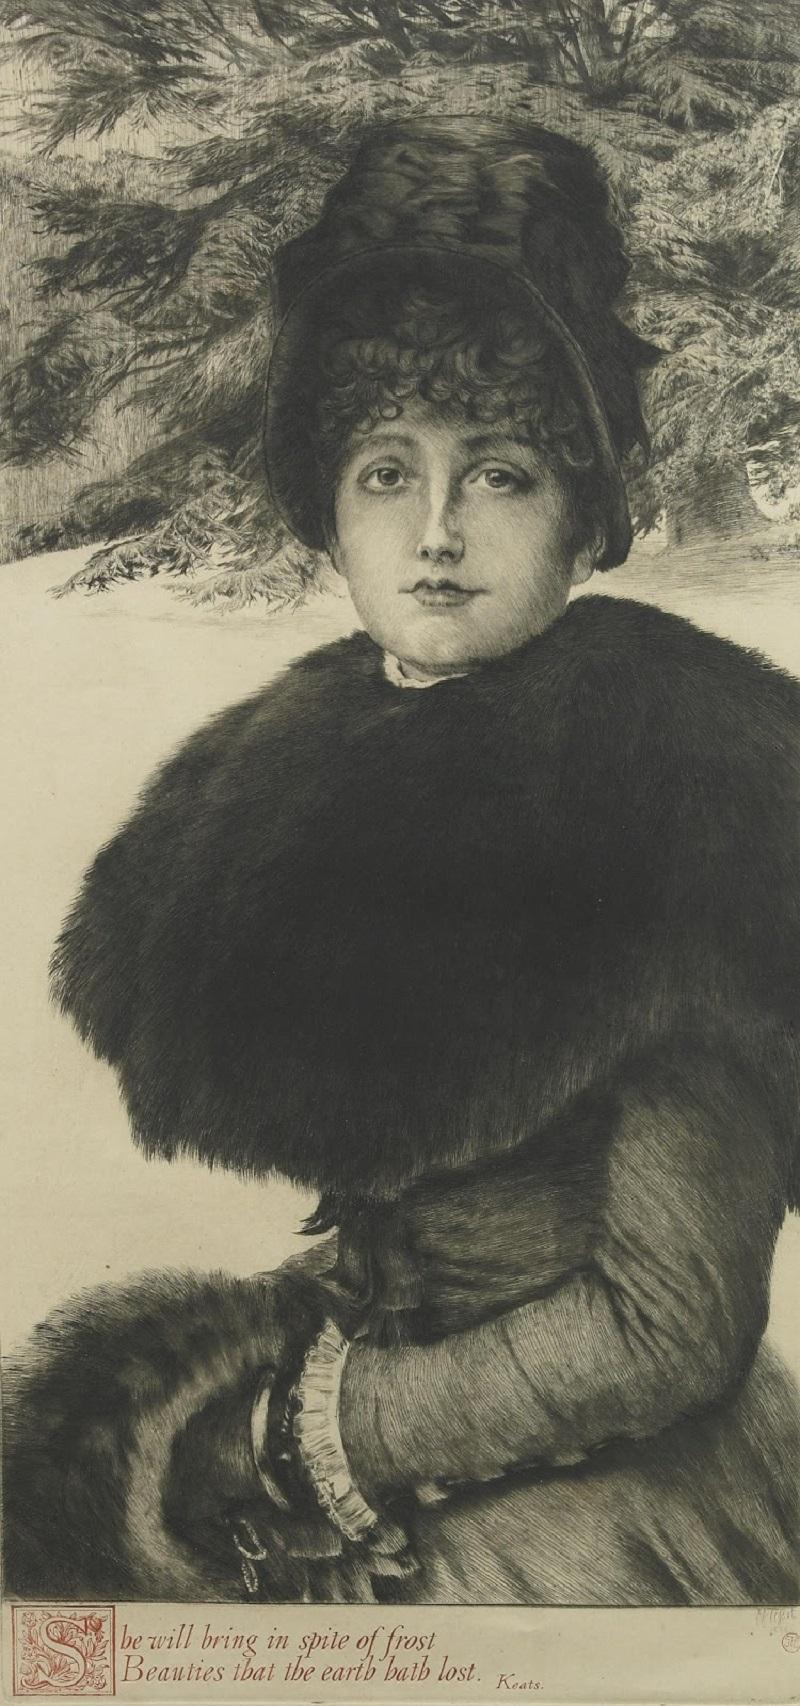 1880 Прогулка по снегу